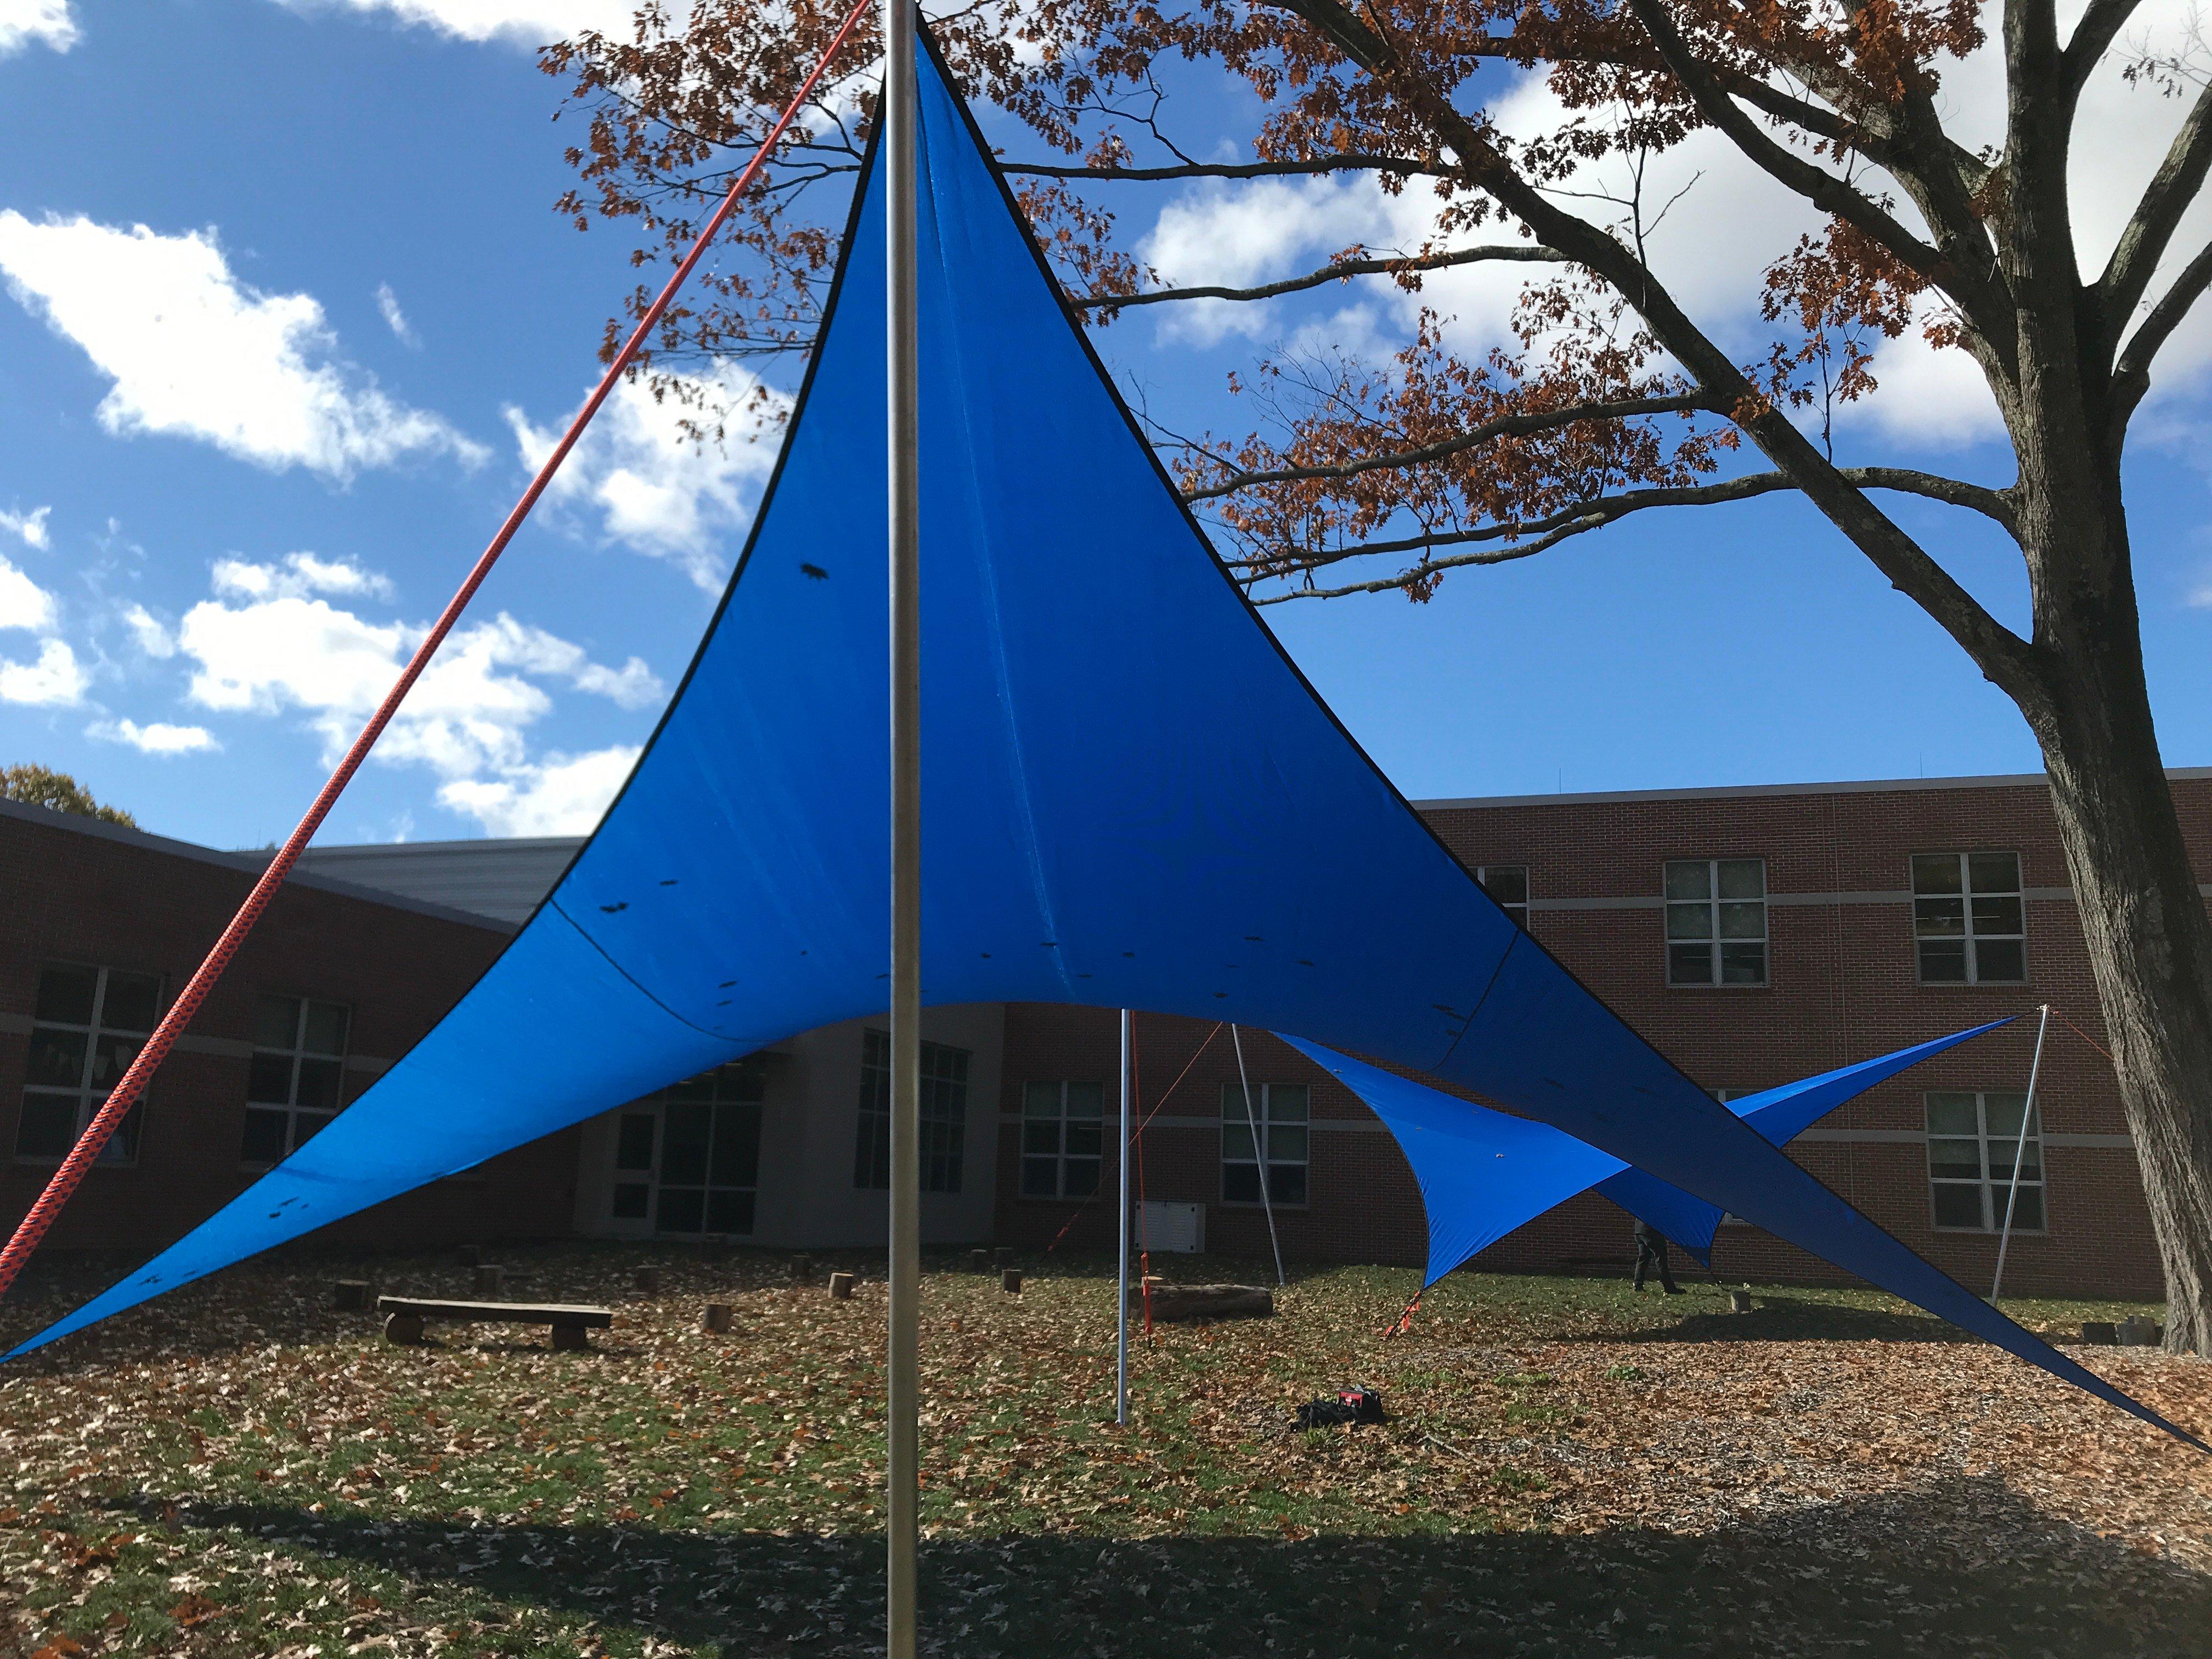 Rowe School Outdoor Classroom Shade Wings